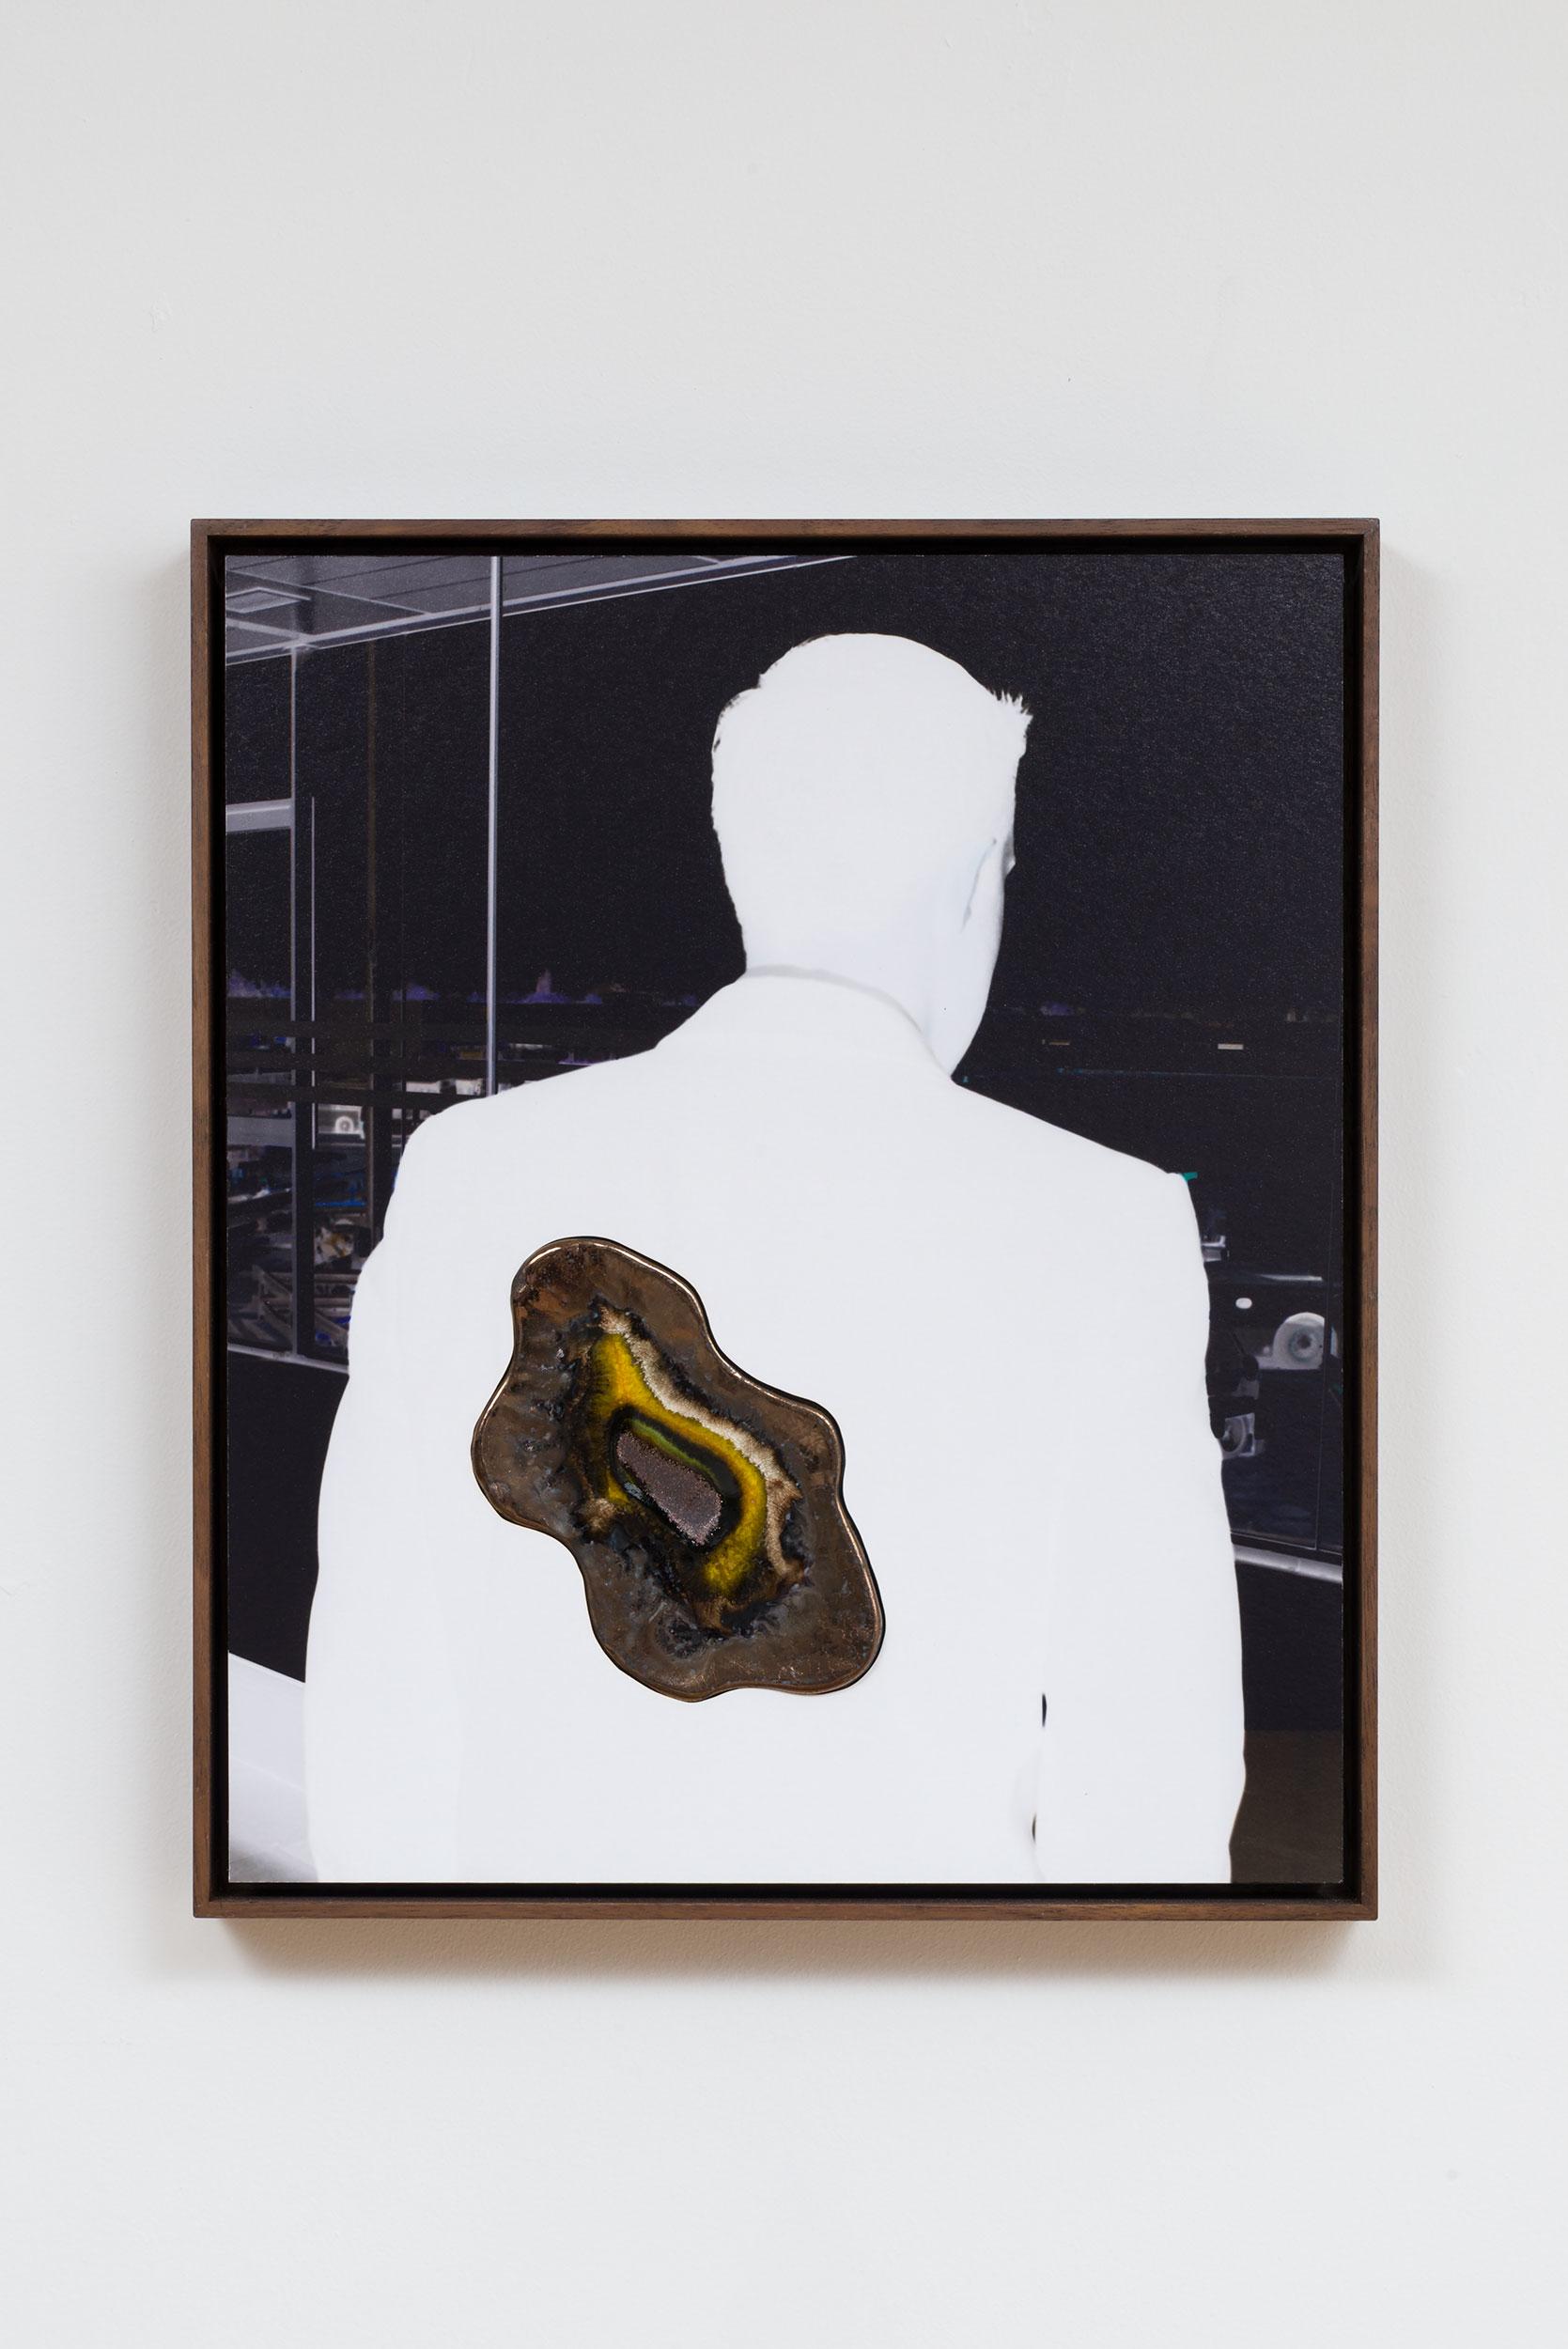 Denis Darzacq & Anna Lüneman,  Doublemix No. 20 , 2014  Digital pigment print with earthenware insert, 16.5 x 14 x 1.75 in (approx. 42 × 36 x 4 cm), unique   Inquire